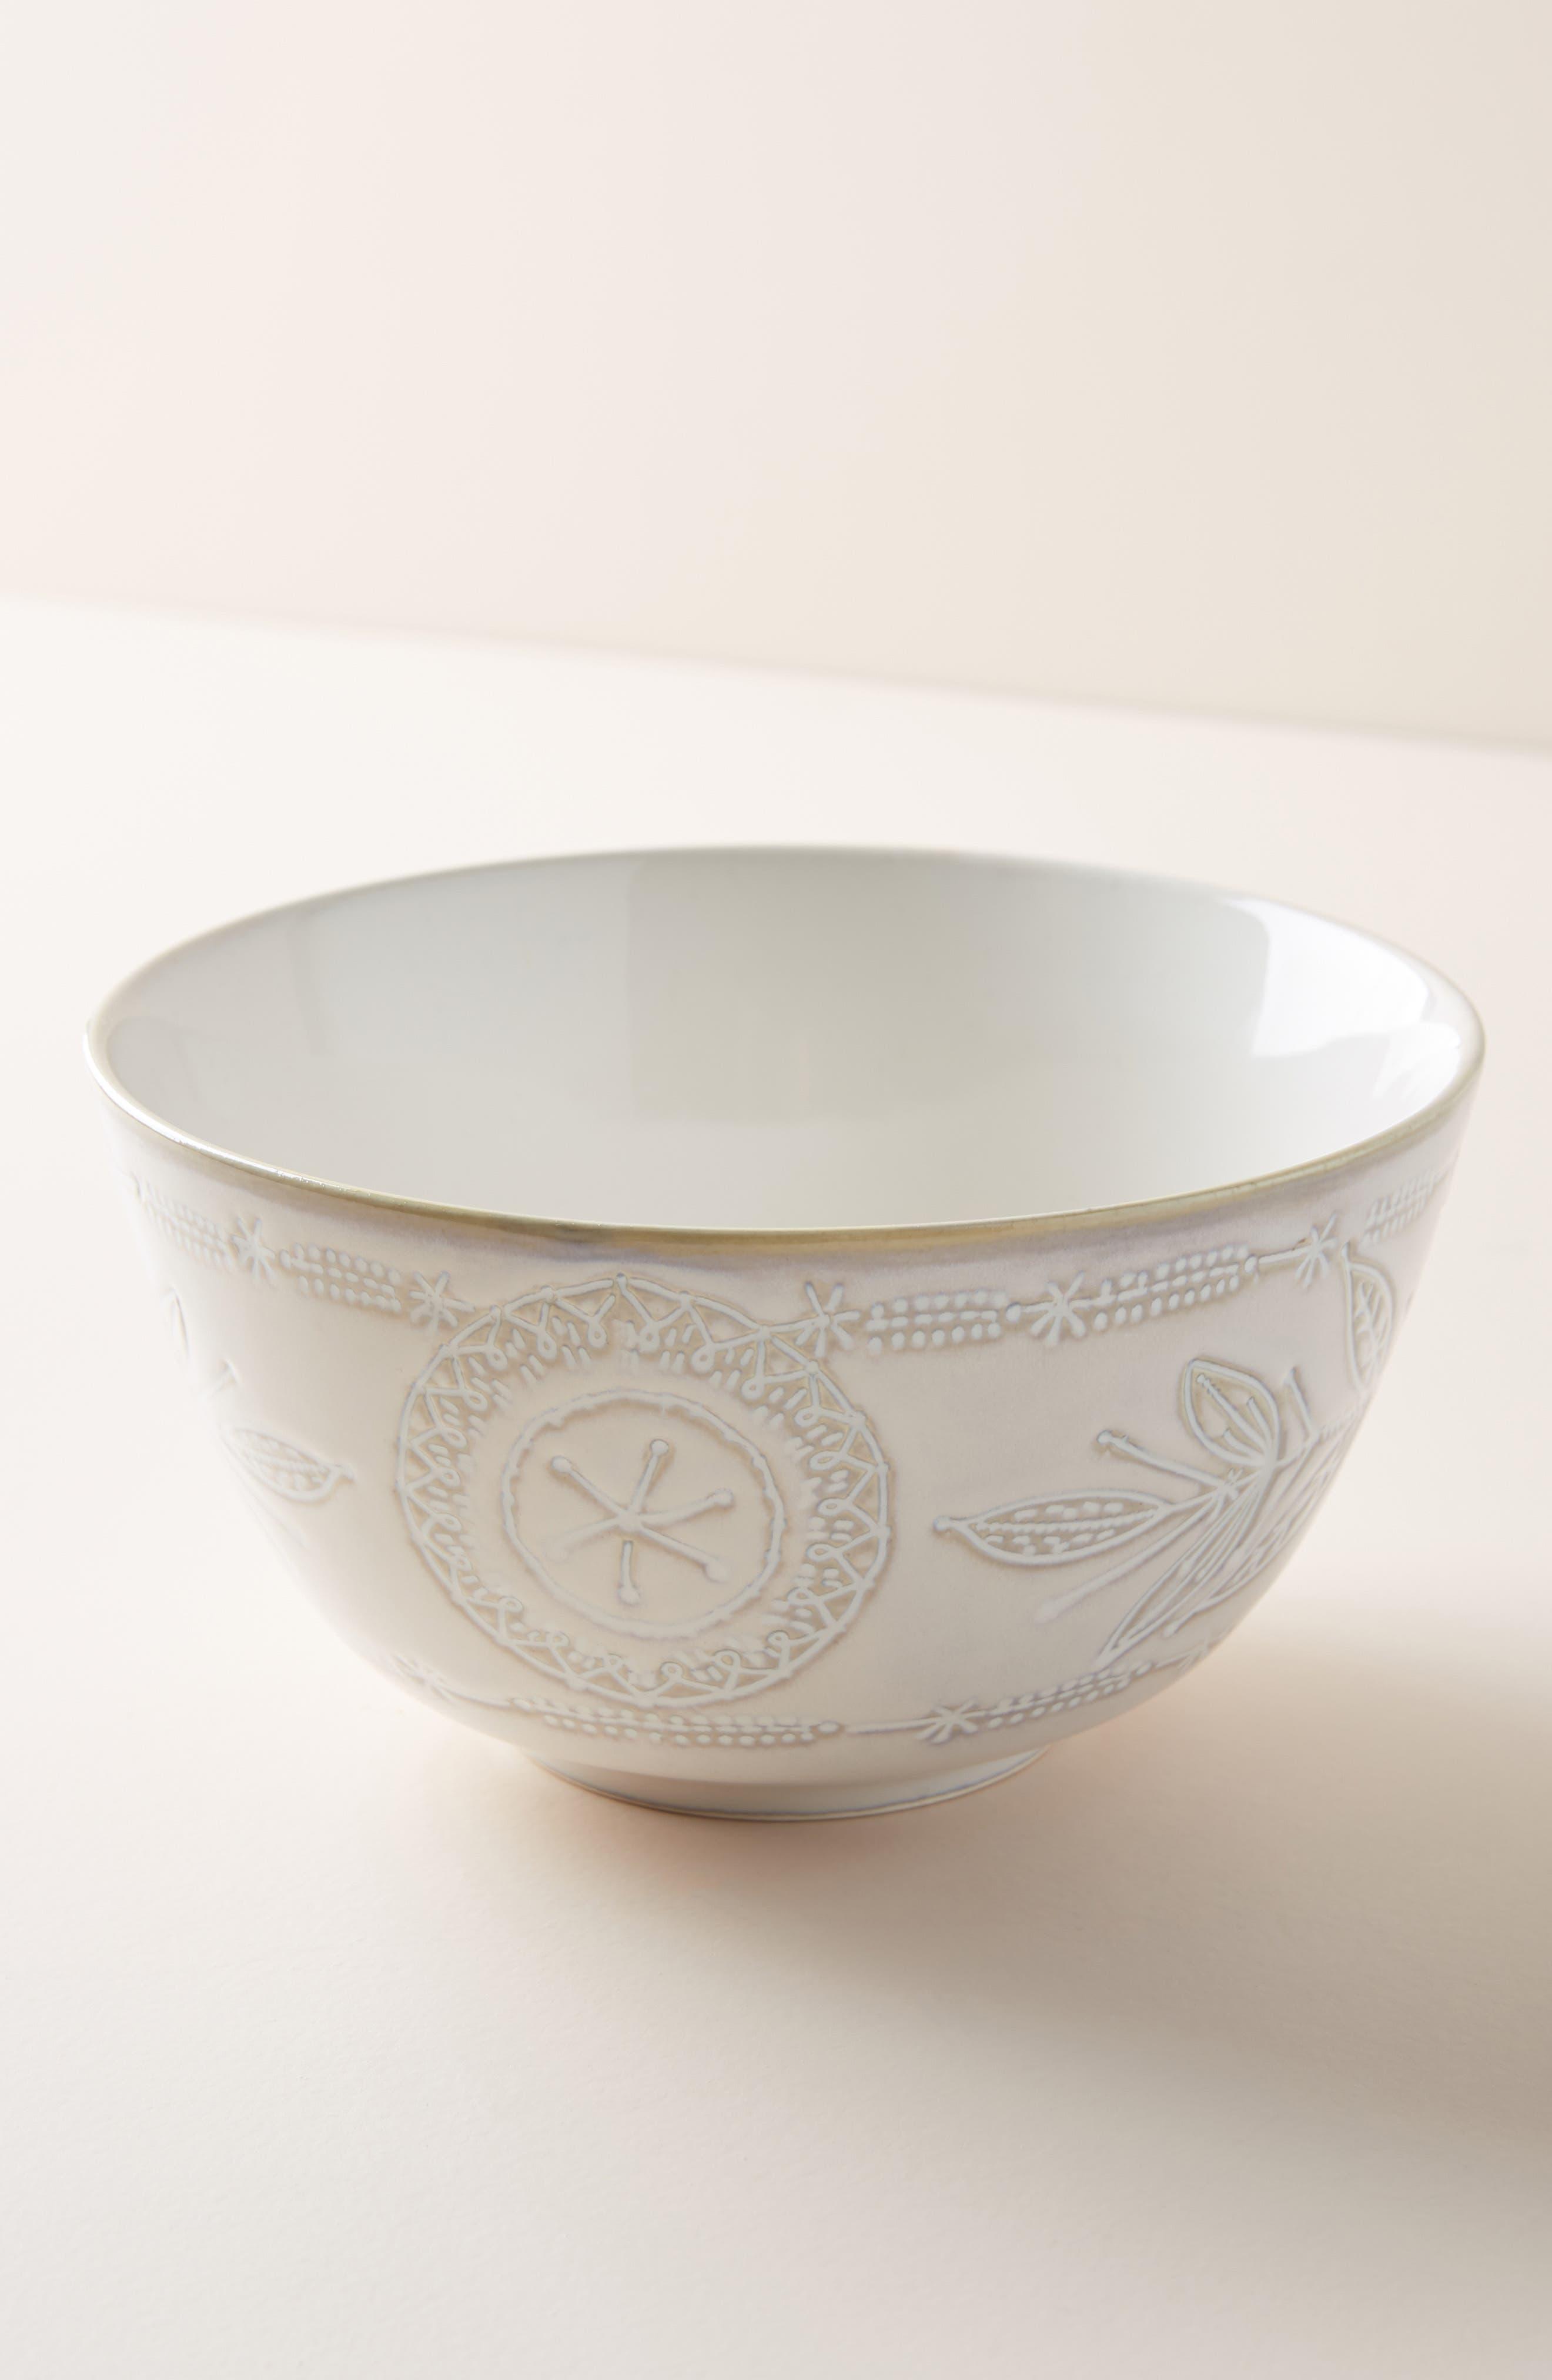 ANTHROPOLOGIE, Uret Stoneware Bowl, Main thumbnail 1, color, WHITE